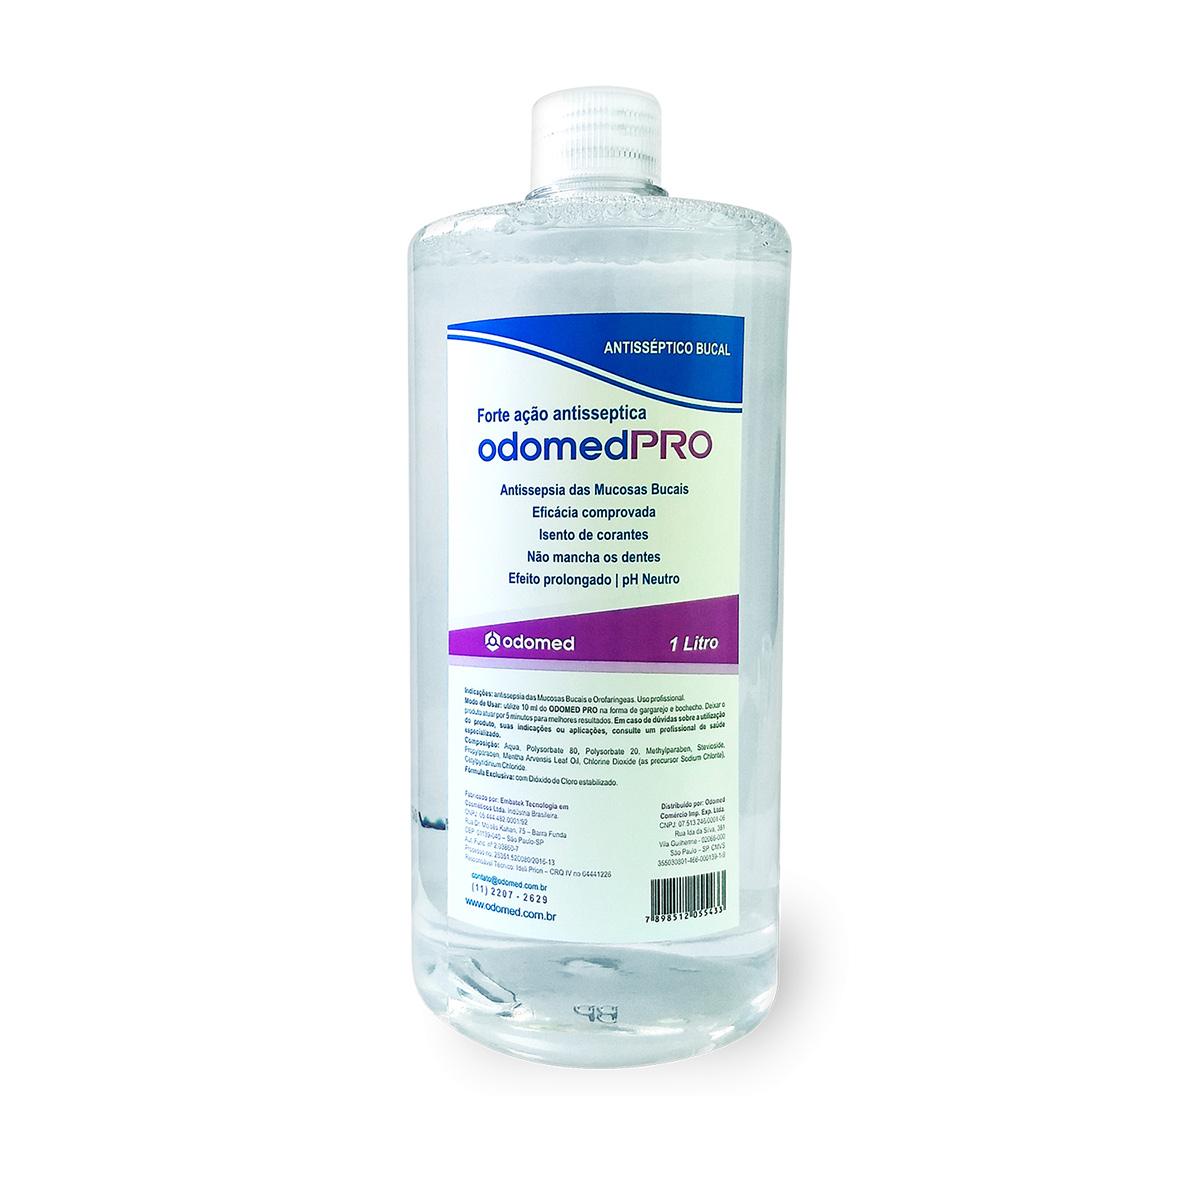 Enxaguante Antisséptico Bucal OdomedPro  - 1 LITRO